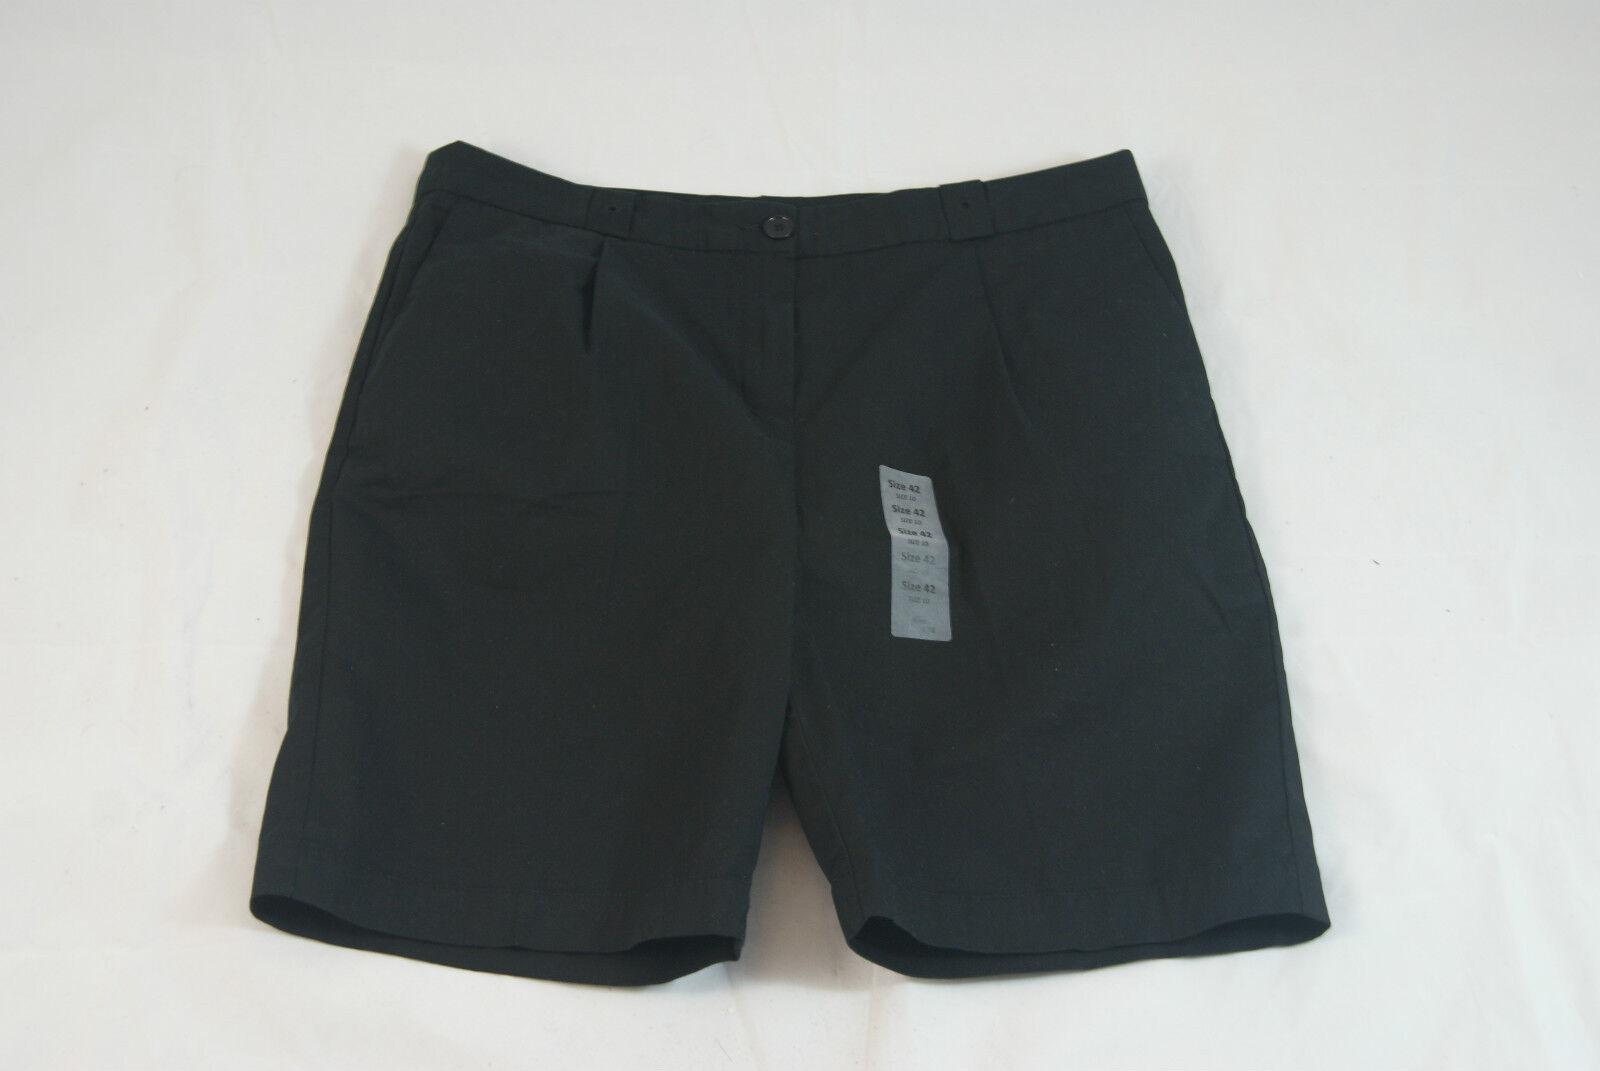 b1f7067f30 Lacoste Women's Black Stretch Cotton Bermuda Walking Shorts Size 6 EU 38  Resort